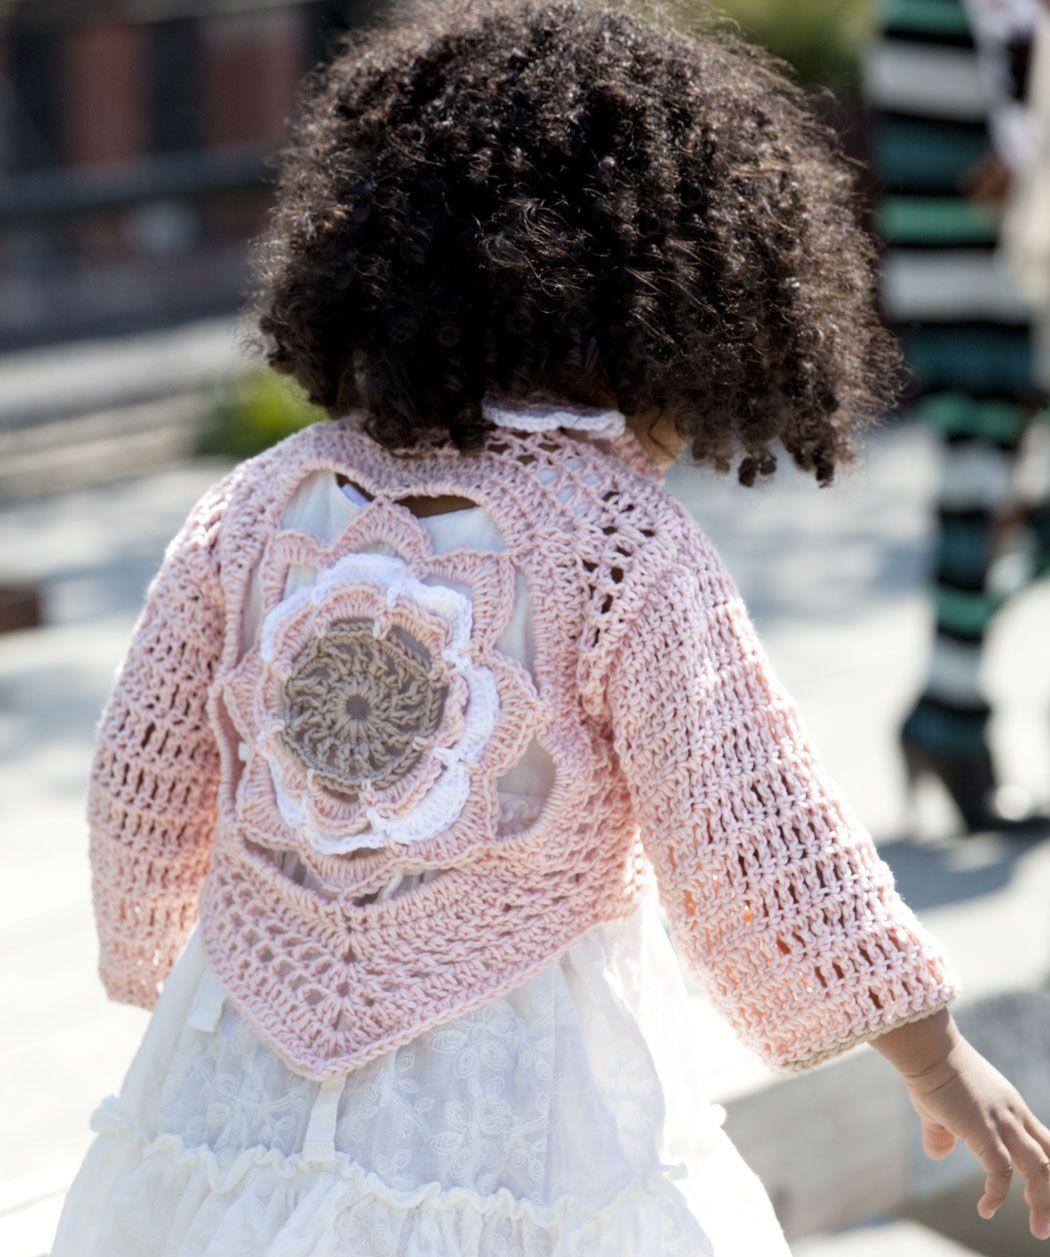 Flower Child\'s Sweater FREE pattern, just stunning. Love it, thanks ...